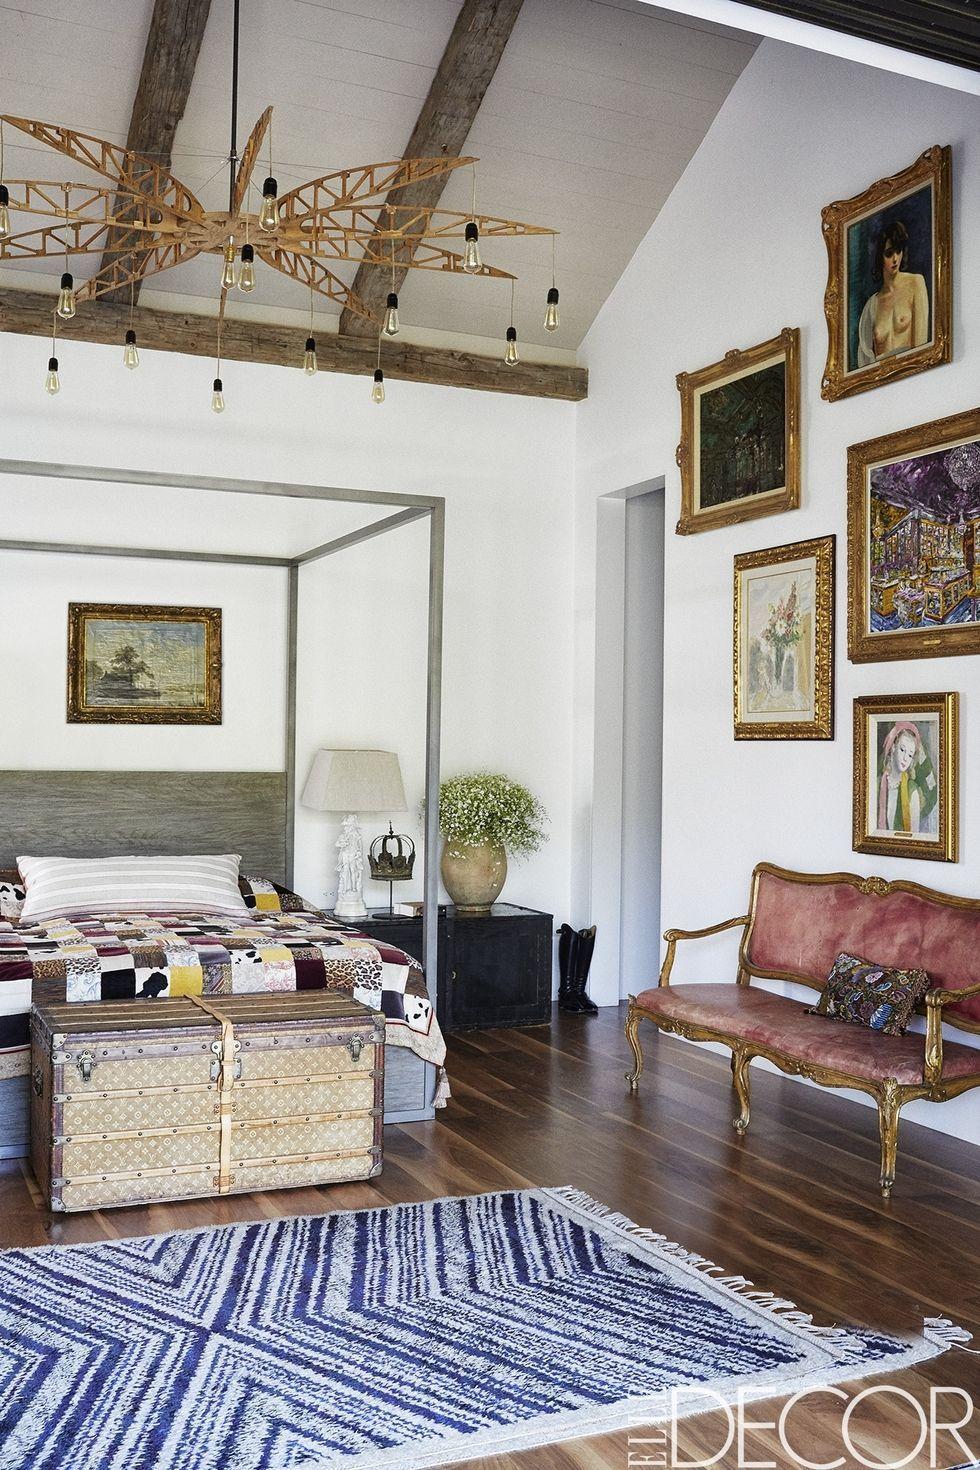 Bedroom Decorating Ideas In Image of Minimalist